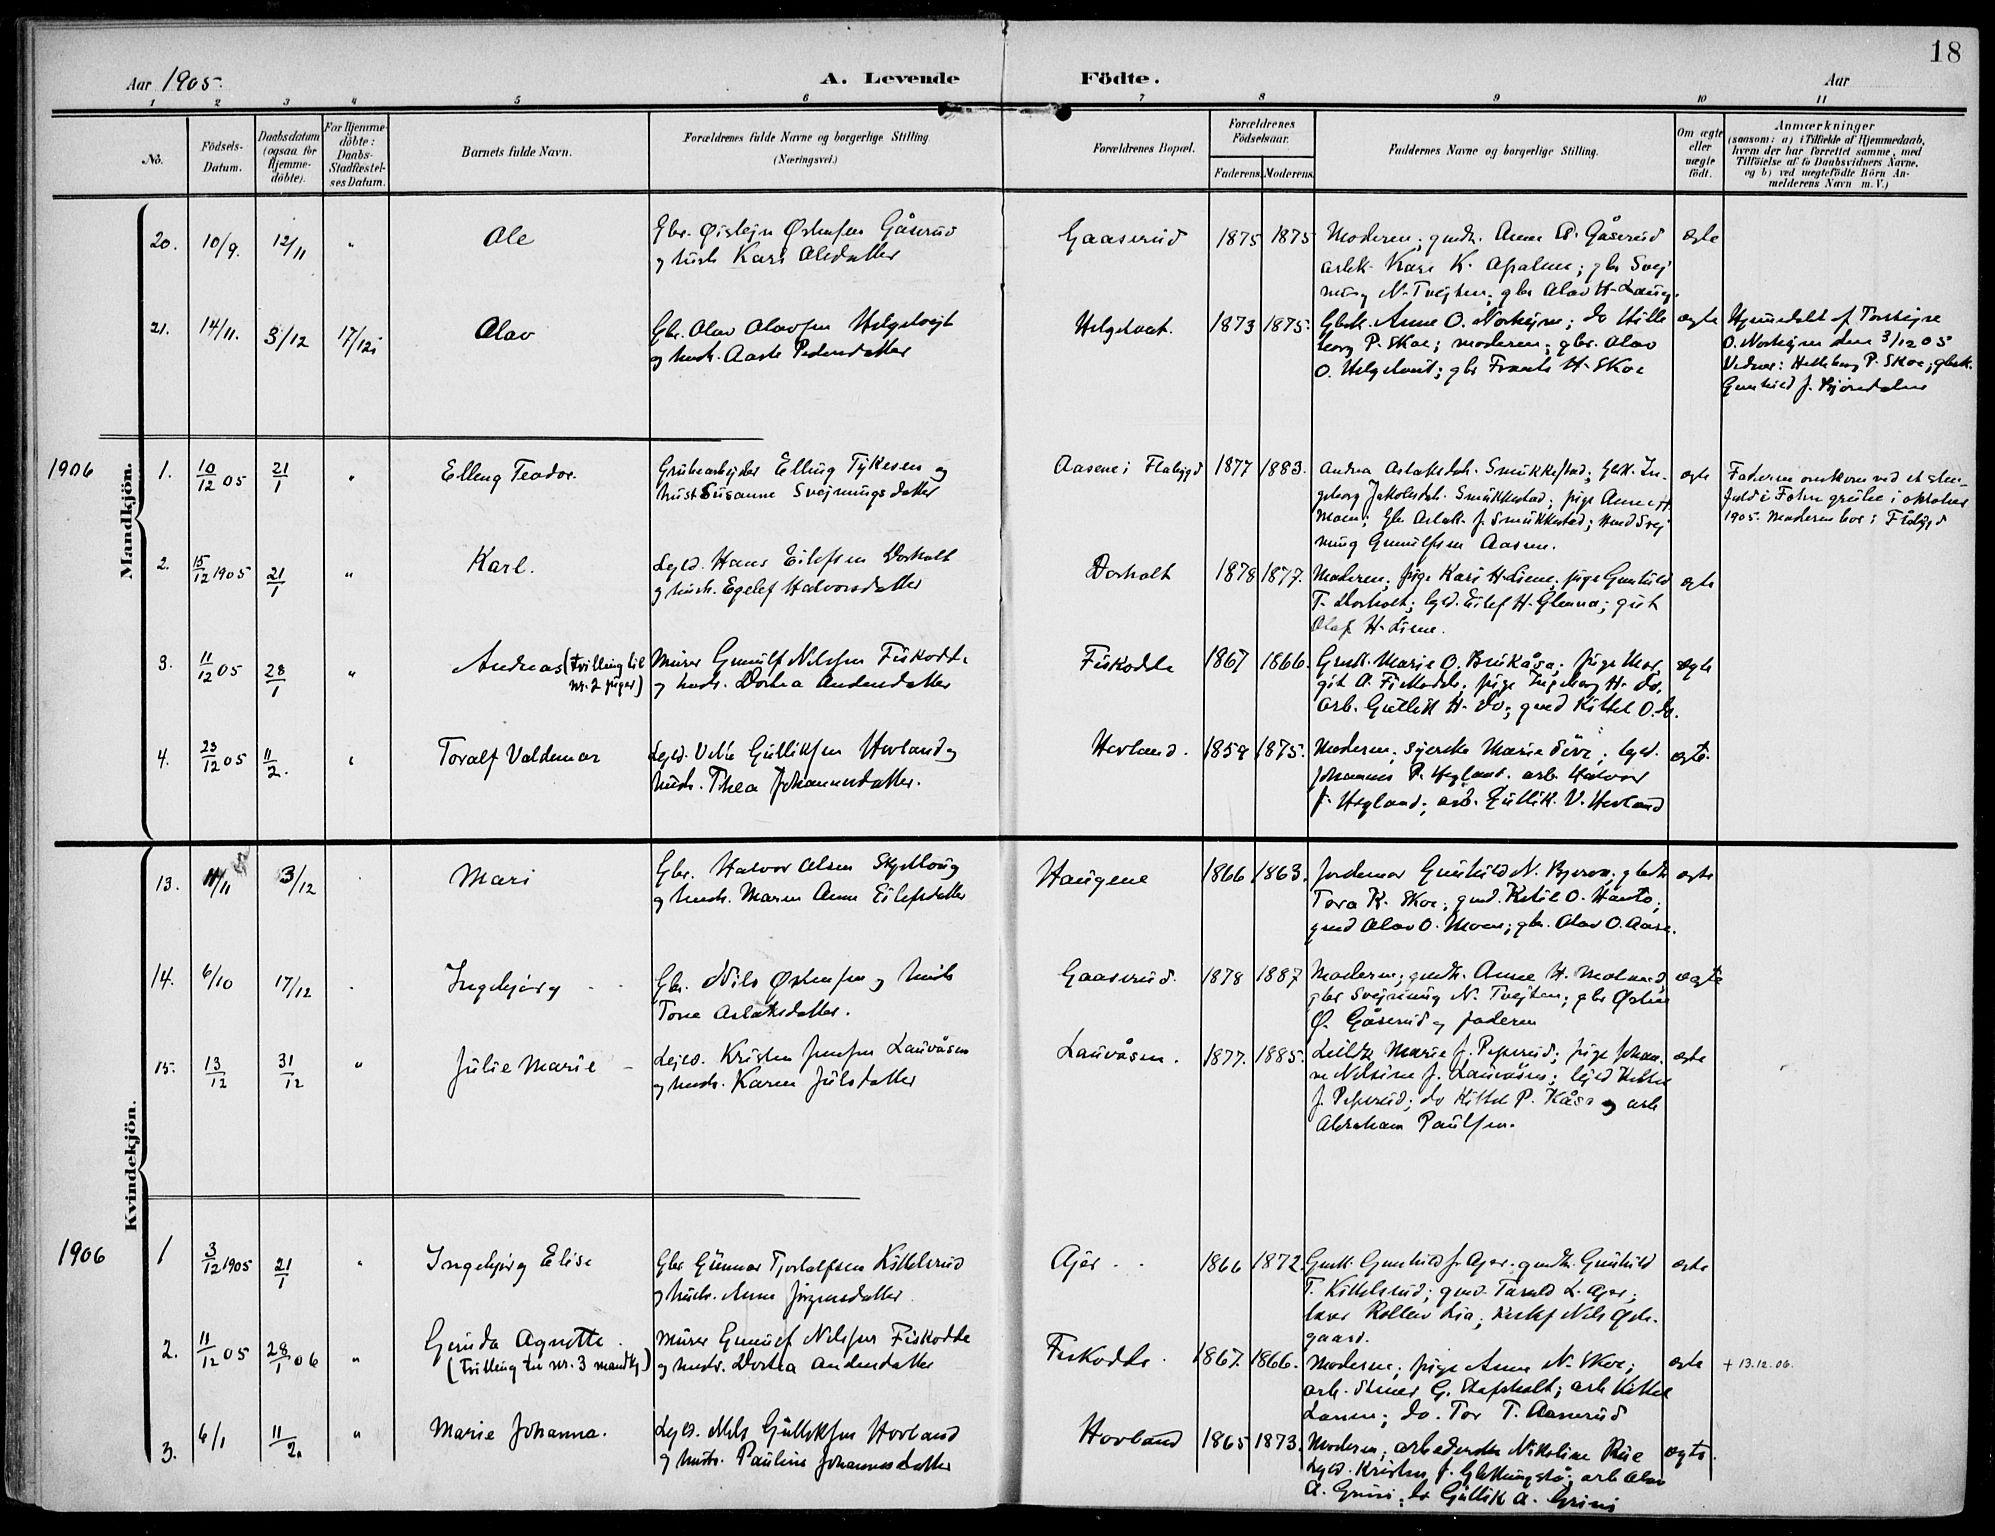 SAKO, Lunde kirkebøker, F/Fa/L0004: Ministerialbok nr. I 4, 1902-1913, s. 18